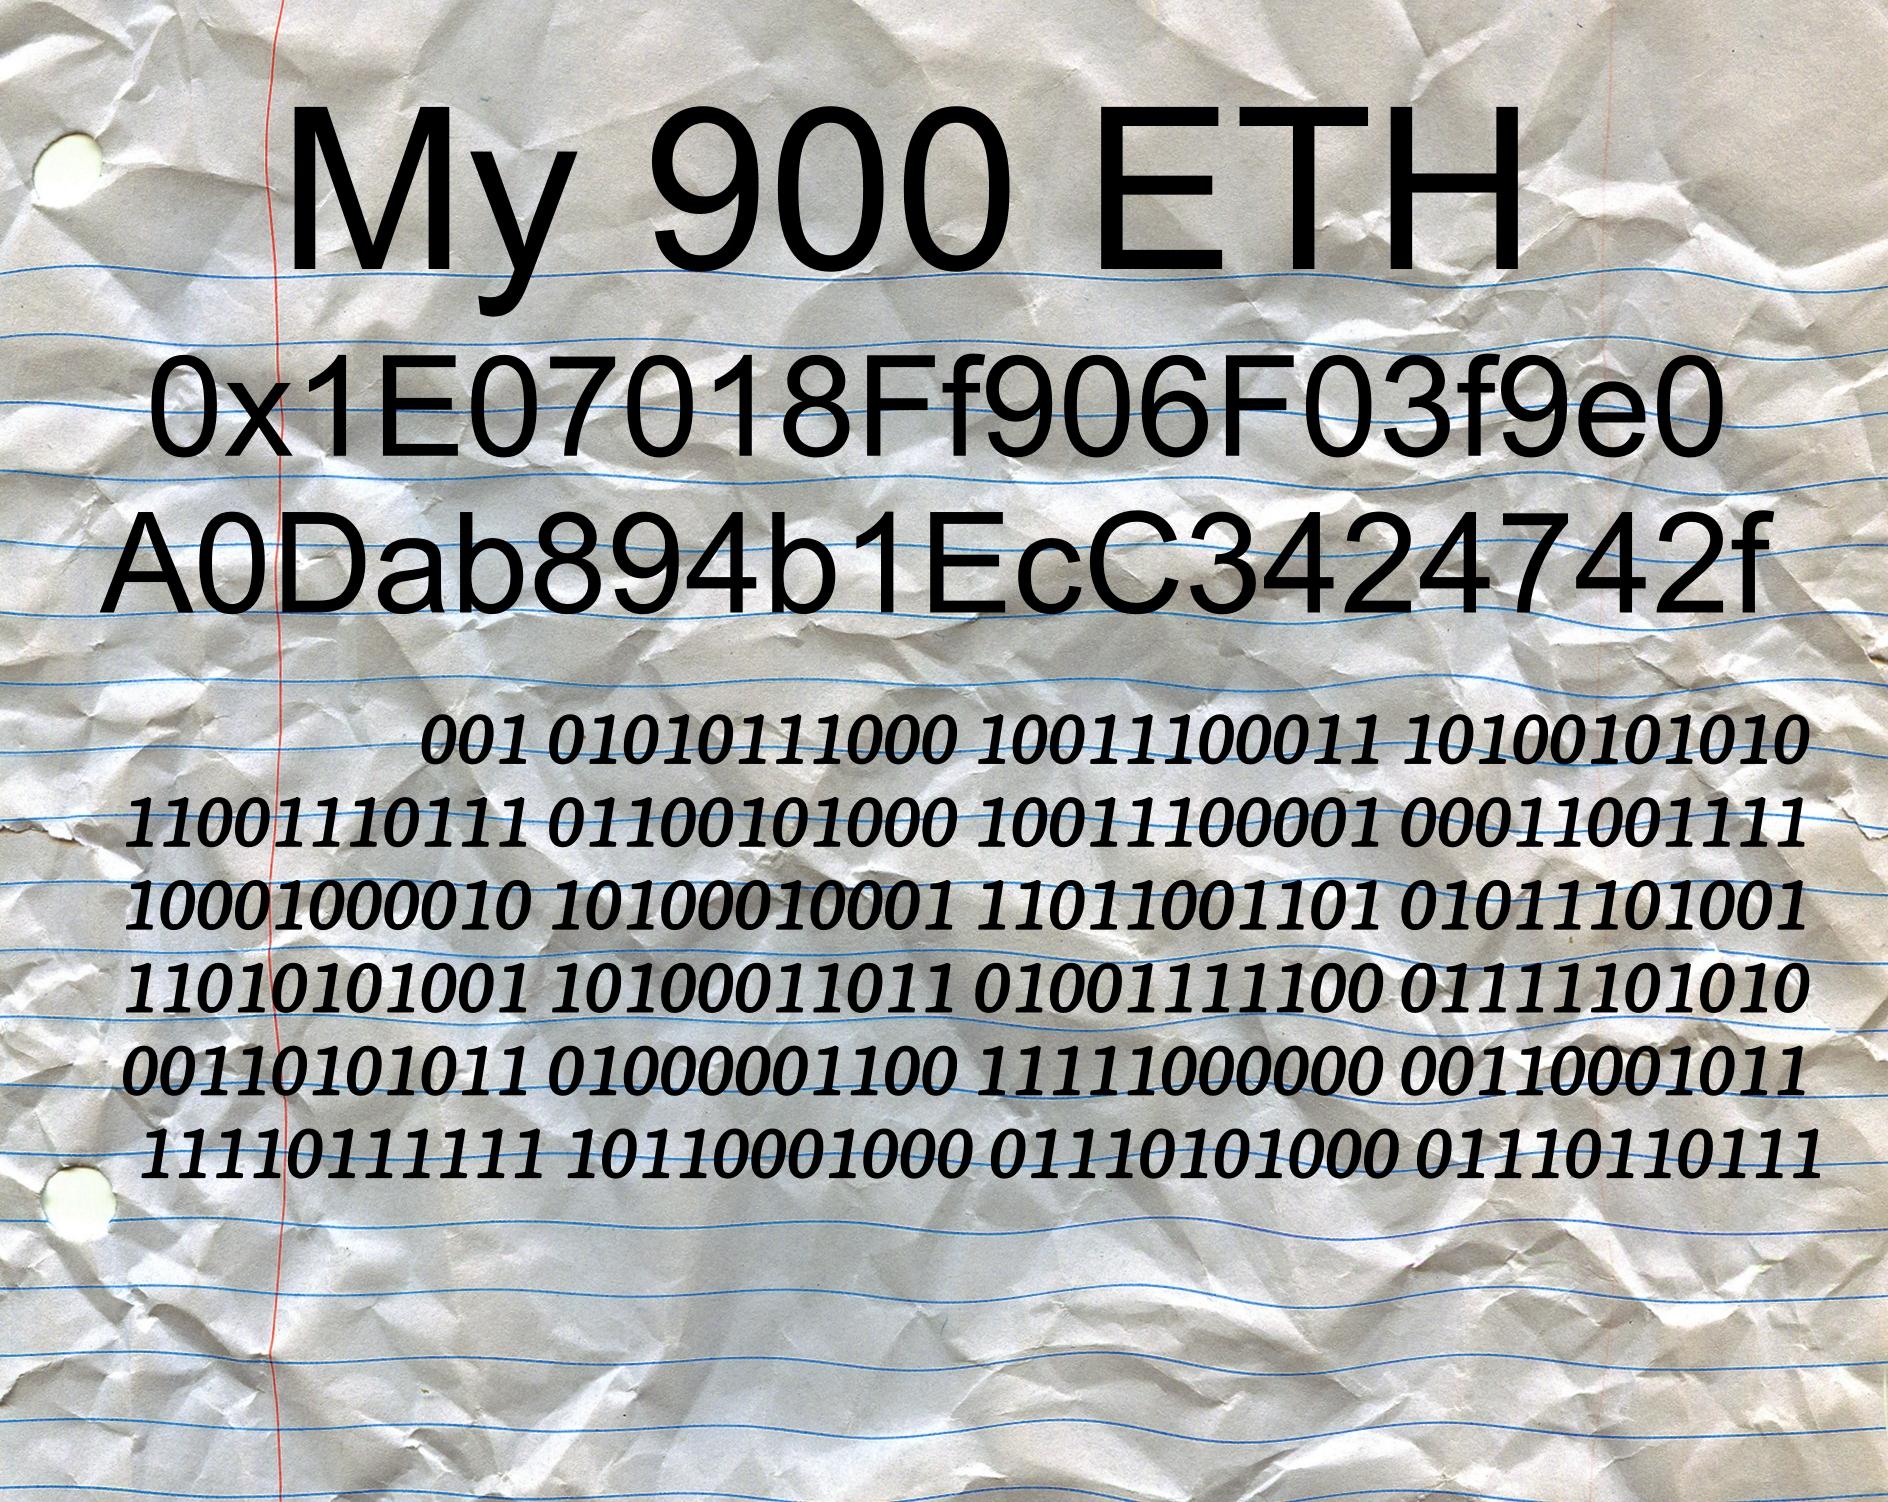 my900eth.jpg